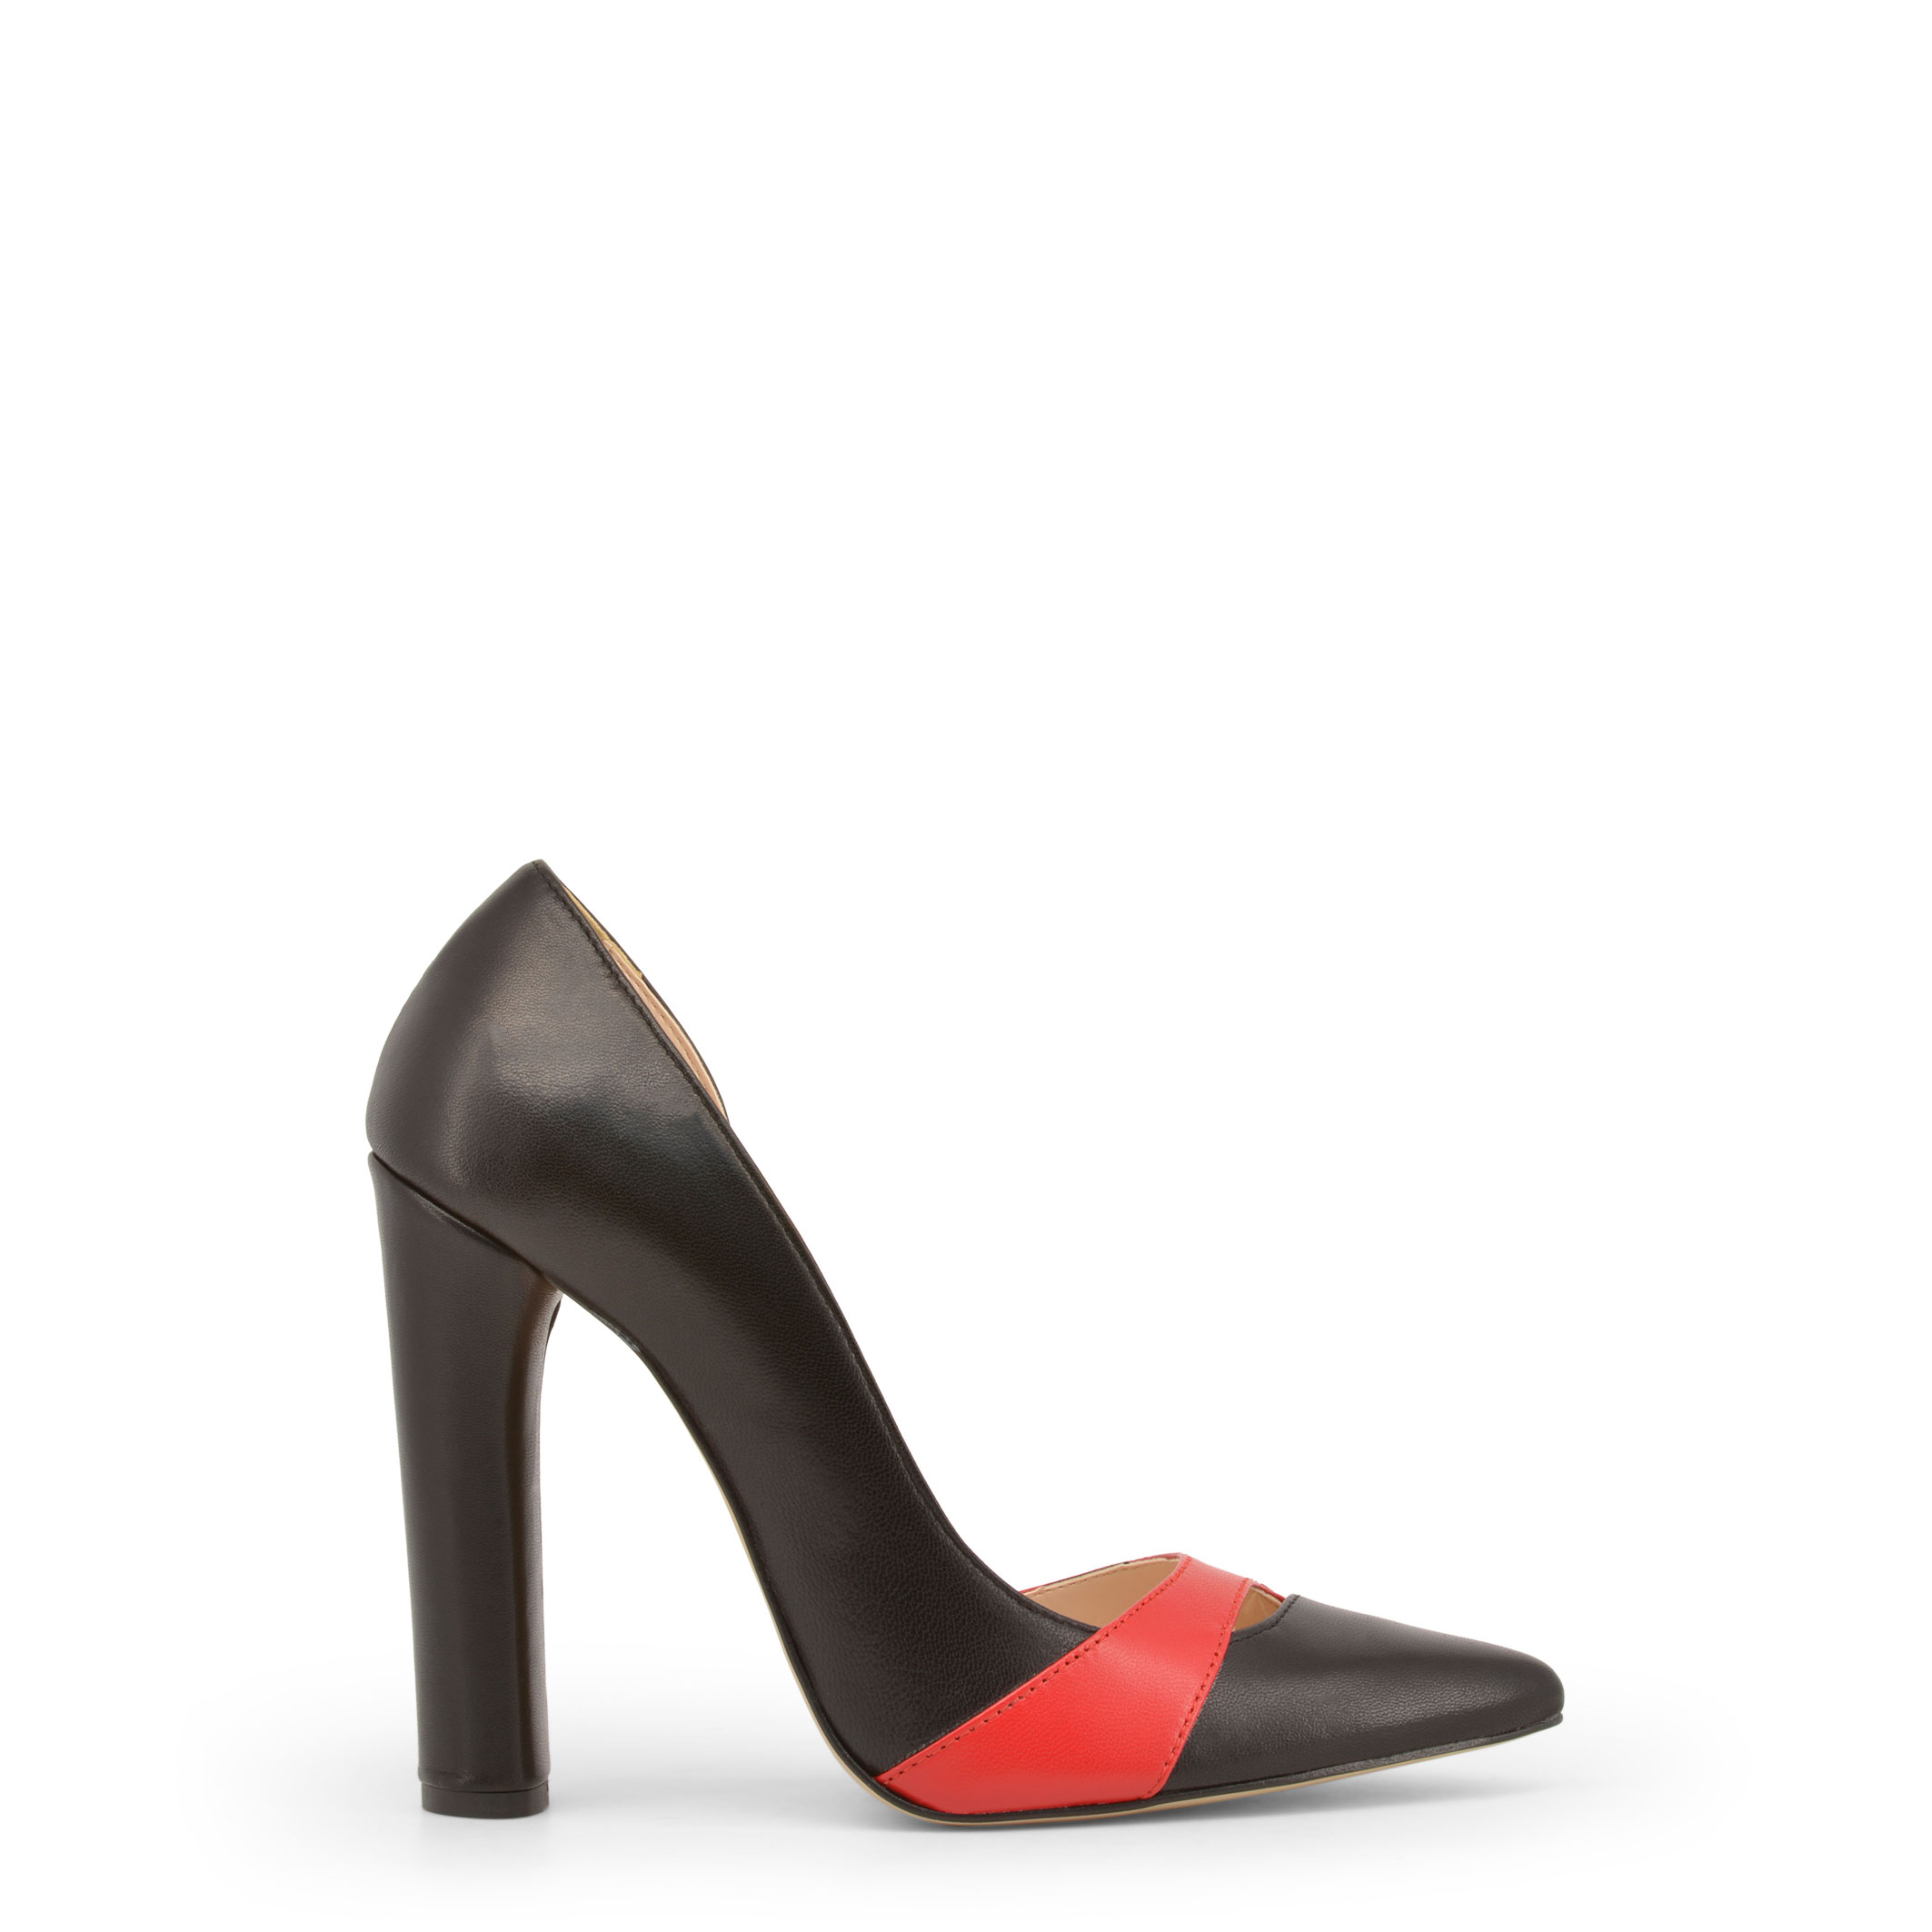 Made-in-Italia-Designer-Markenschuhe-Schuhe-Damen-High-Heels-Schwarz-Schuh